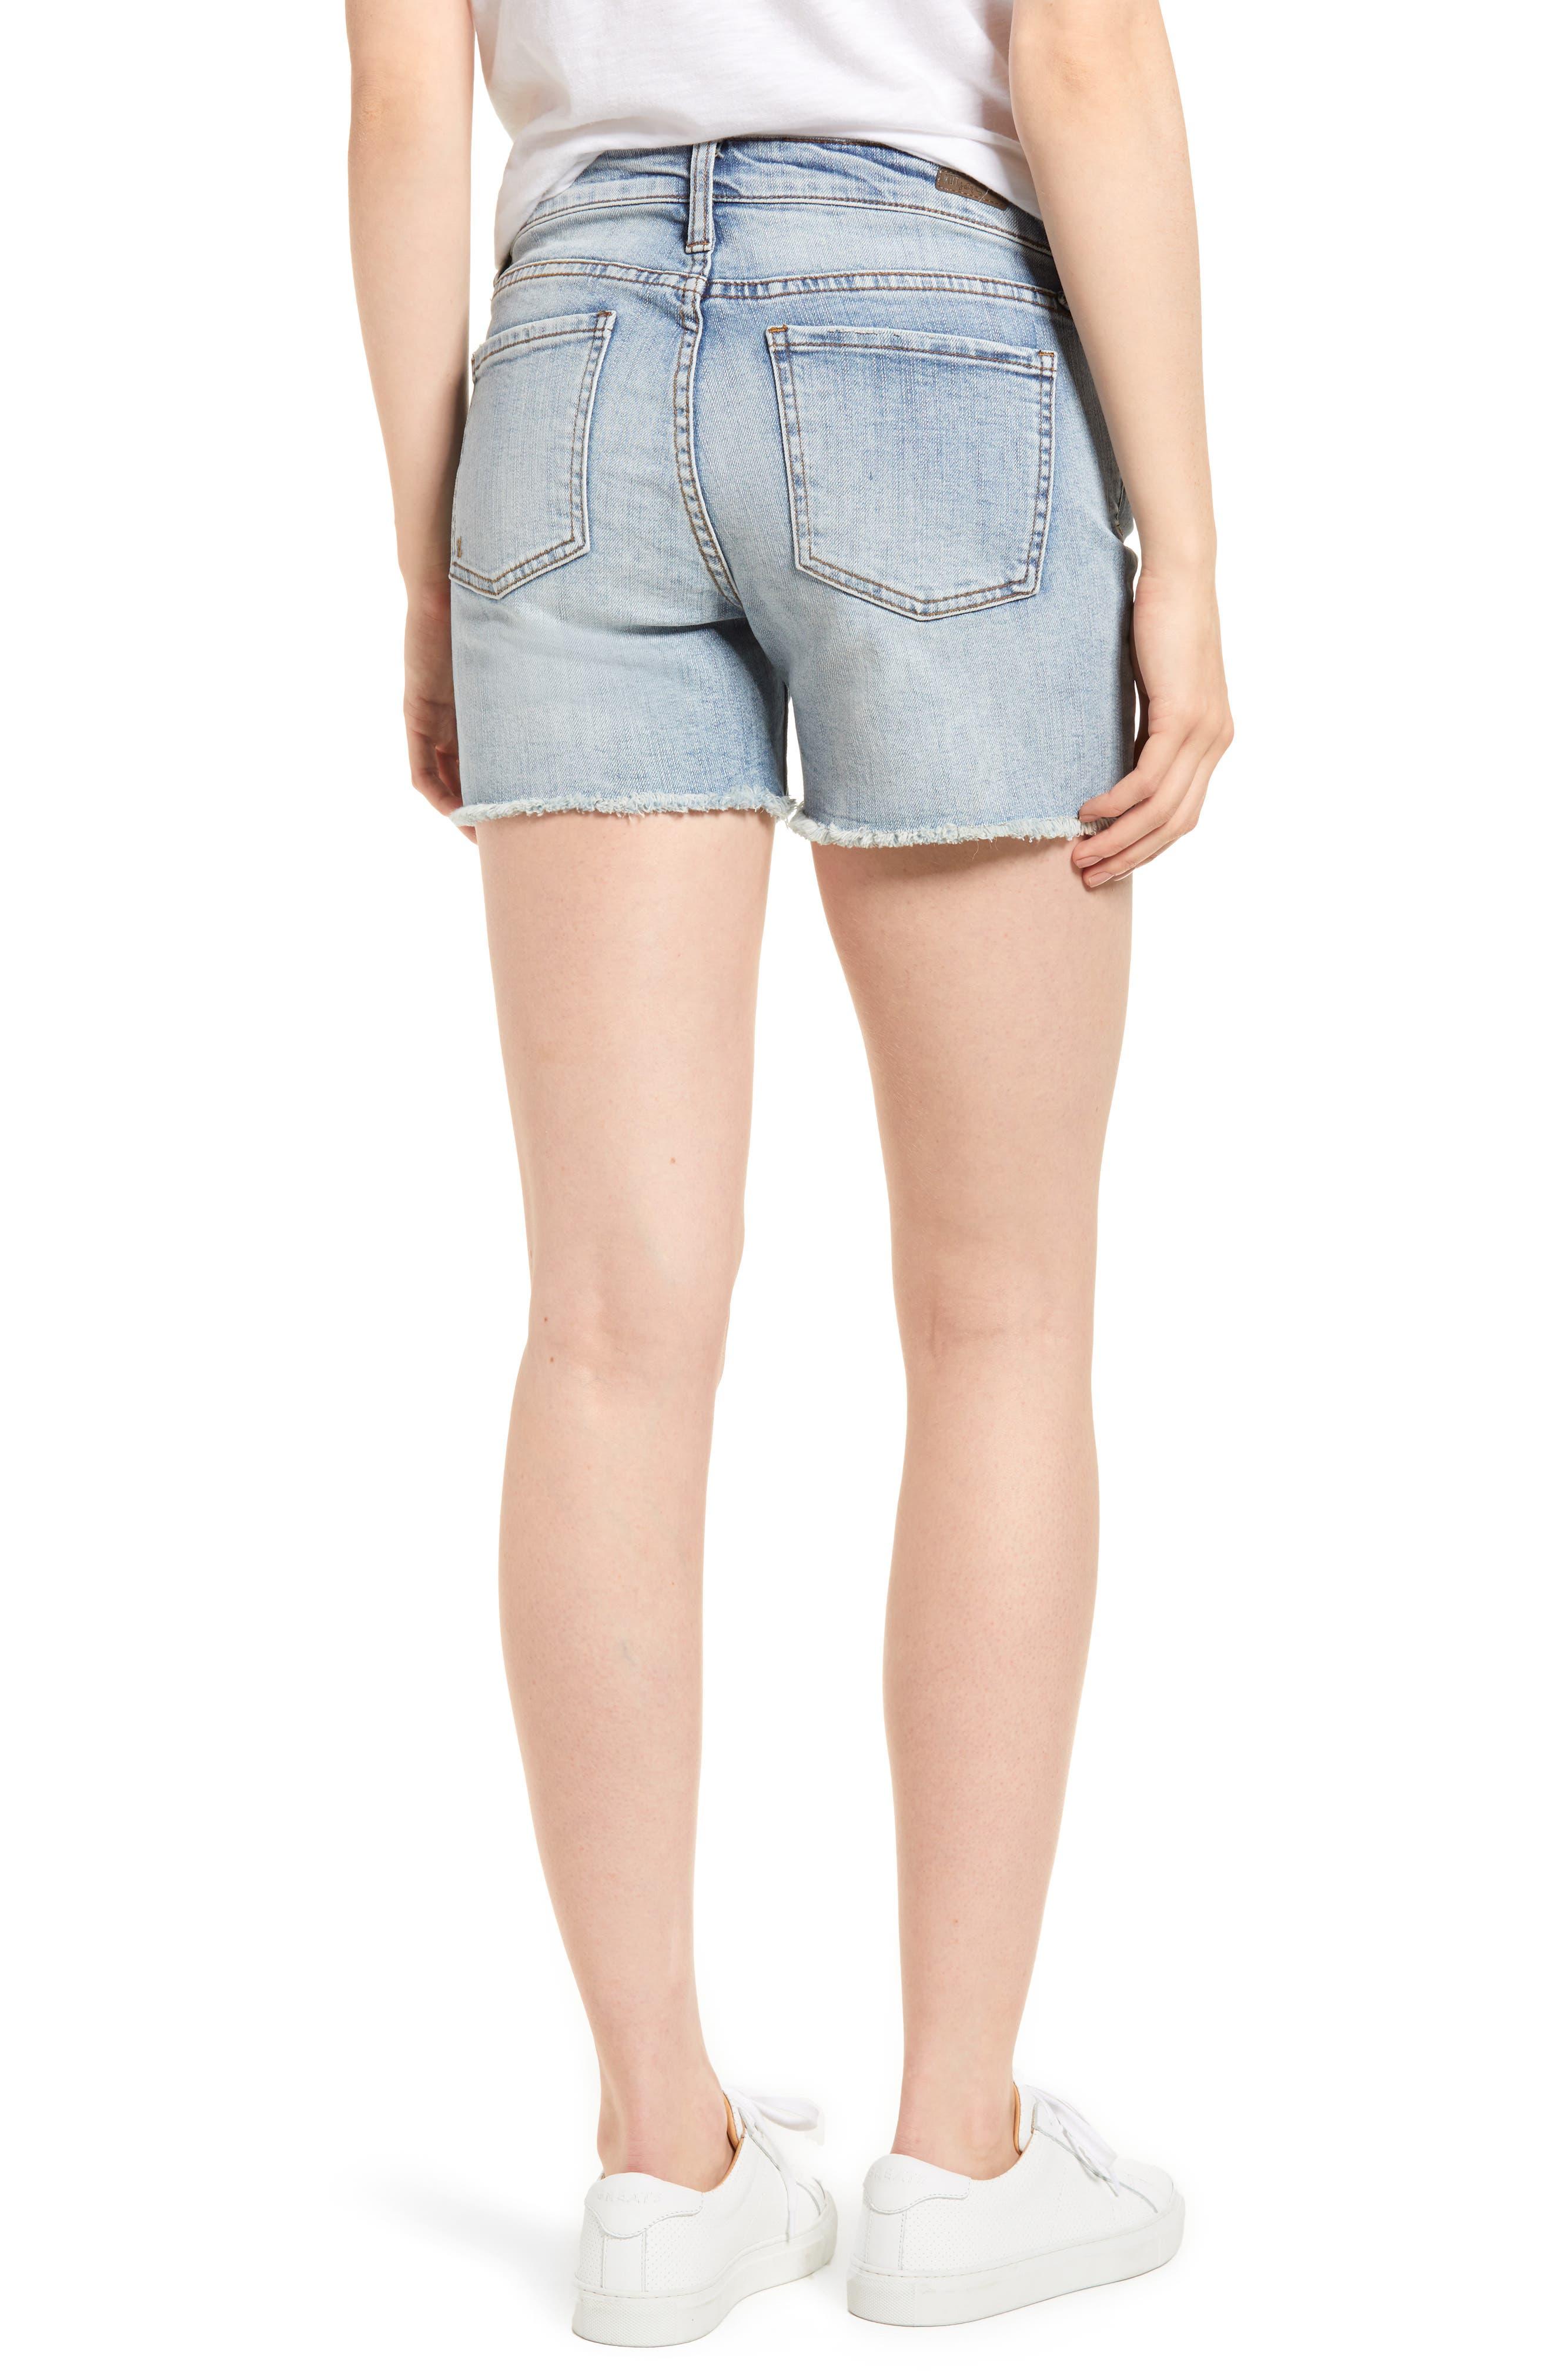 Gidget Cutoff Denim Shorts,                             Alternate thumbnail 2, color,                             470